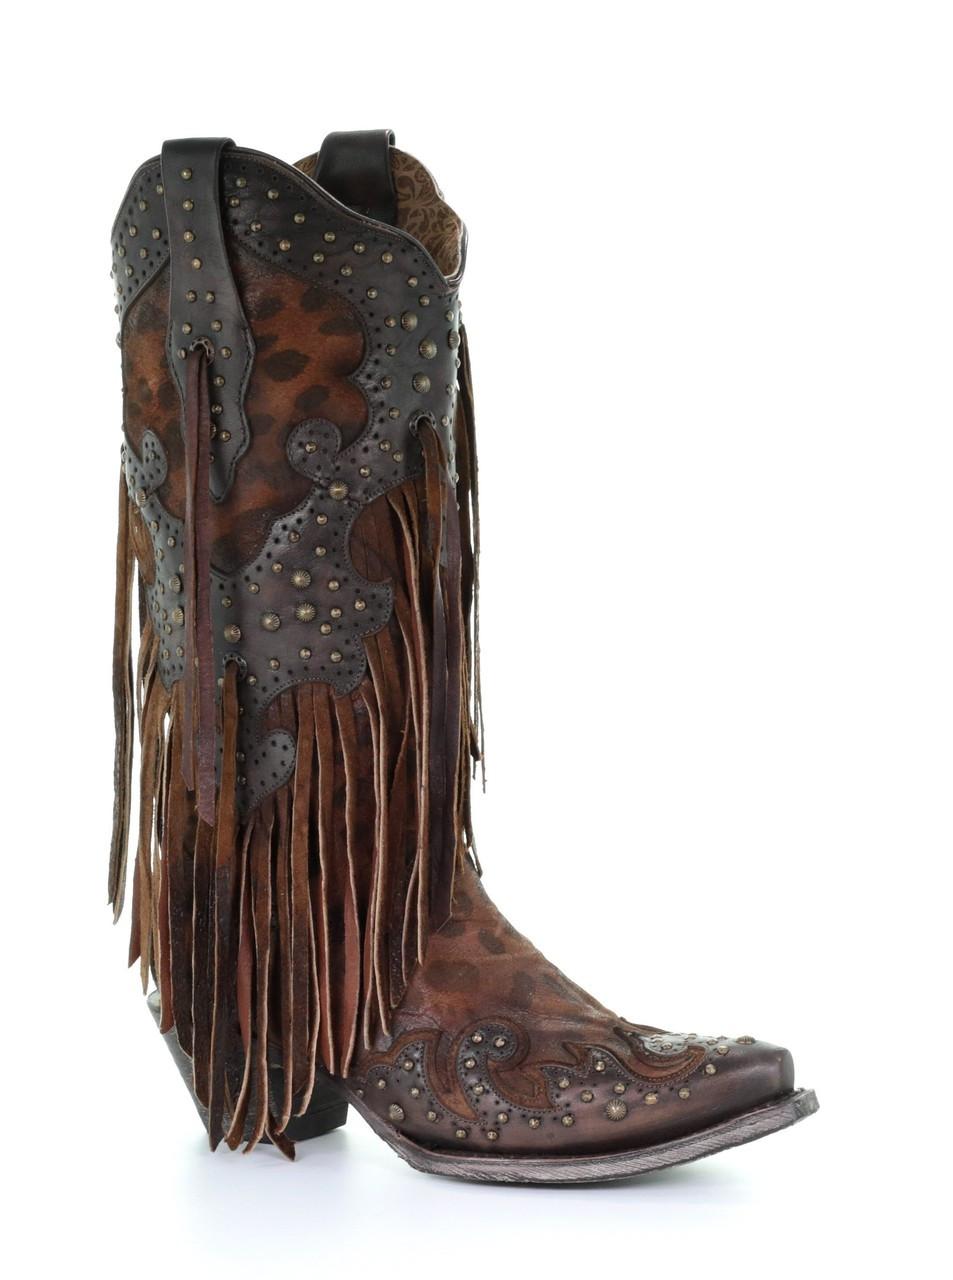 Corral Women s Boots - Honey Goat Overlay   Studs   Fringes - Snip ... c176c91eb0